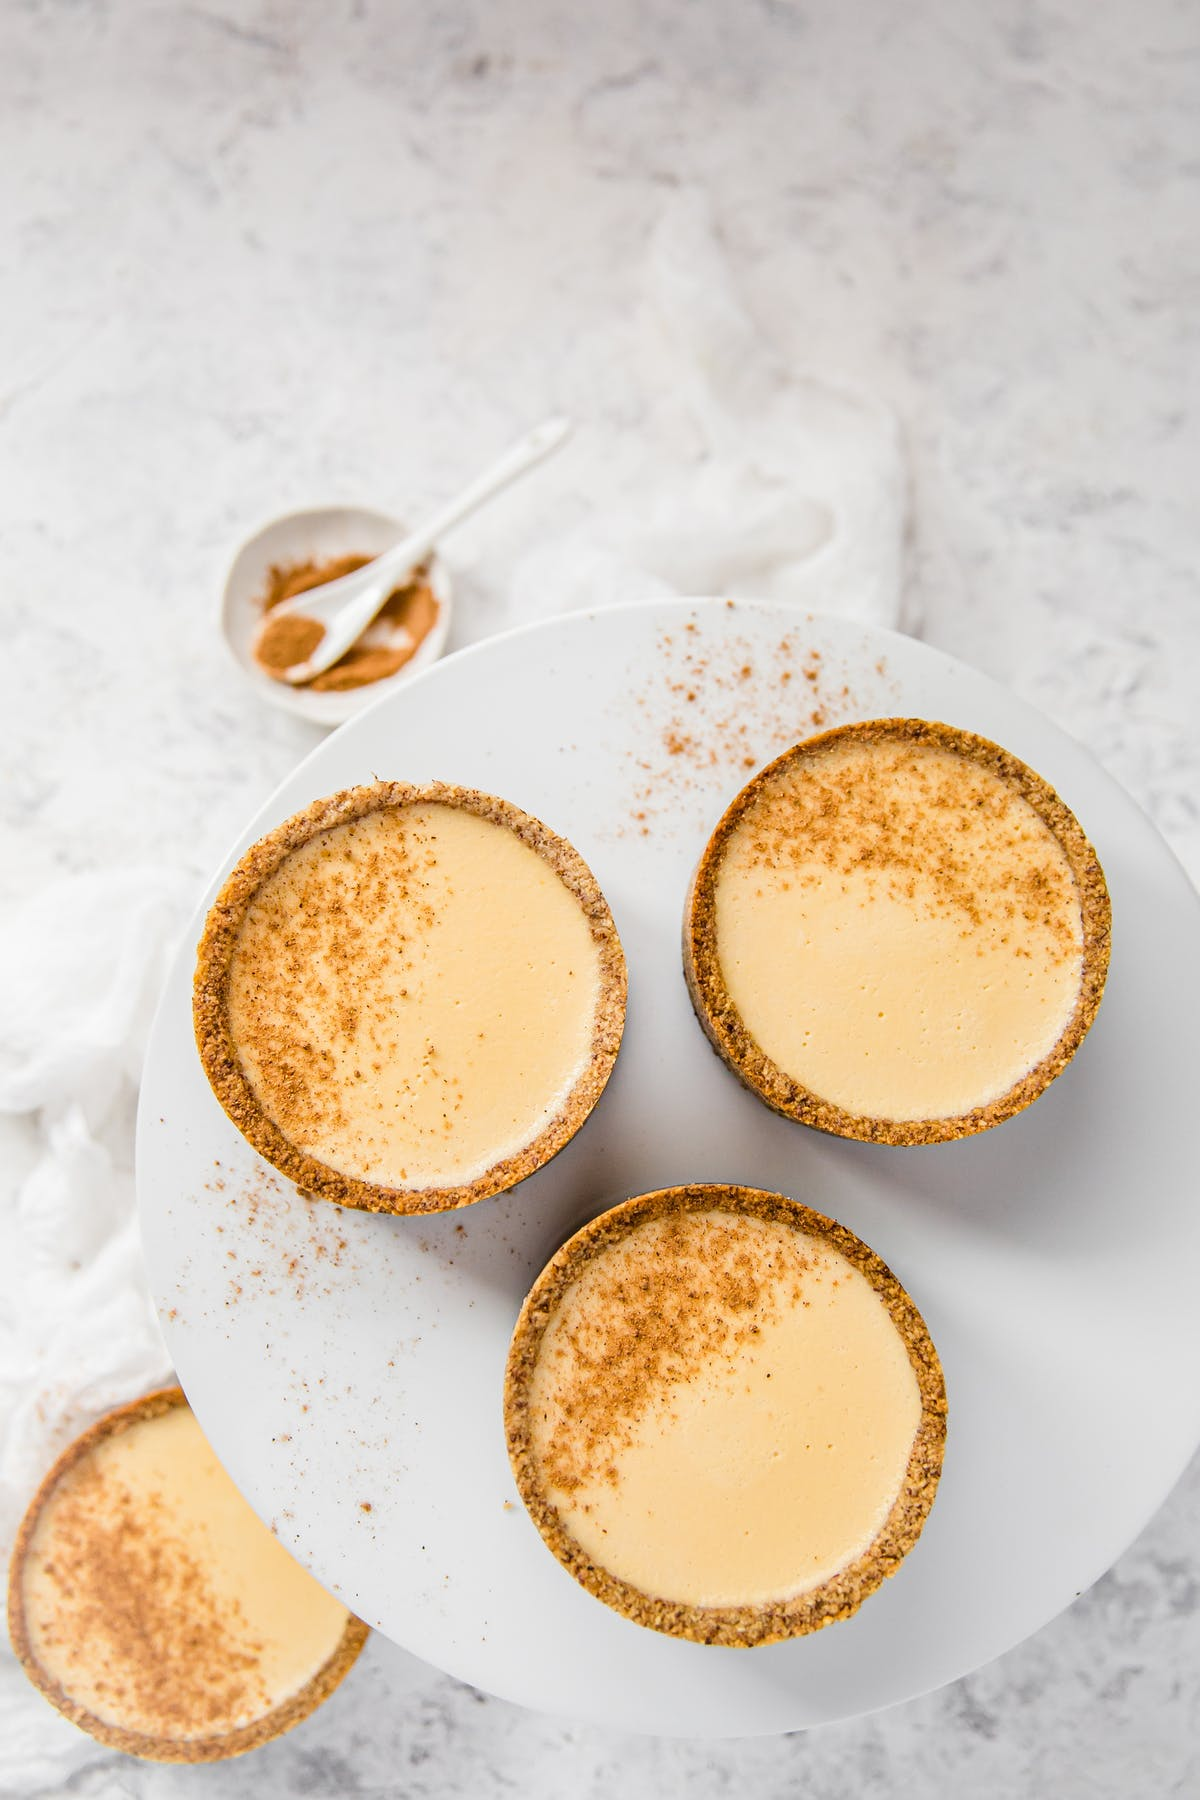 Dairy-free keto egg custard tarts